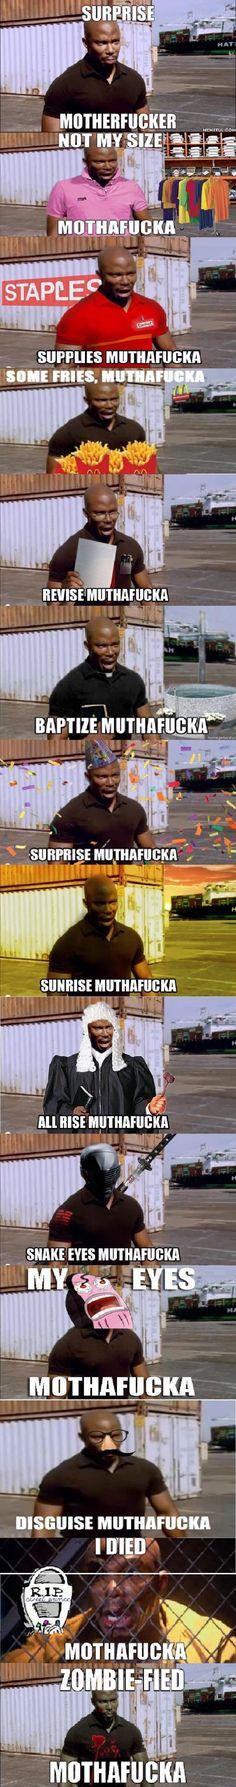 Surprise motherf**ker!